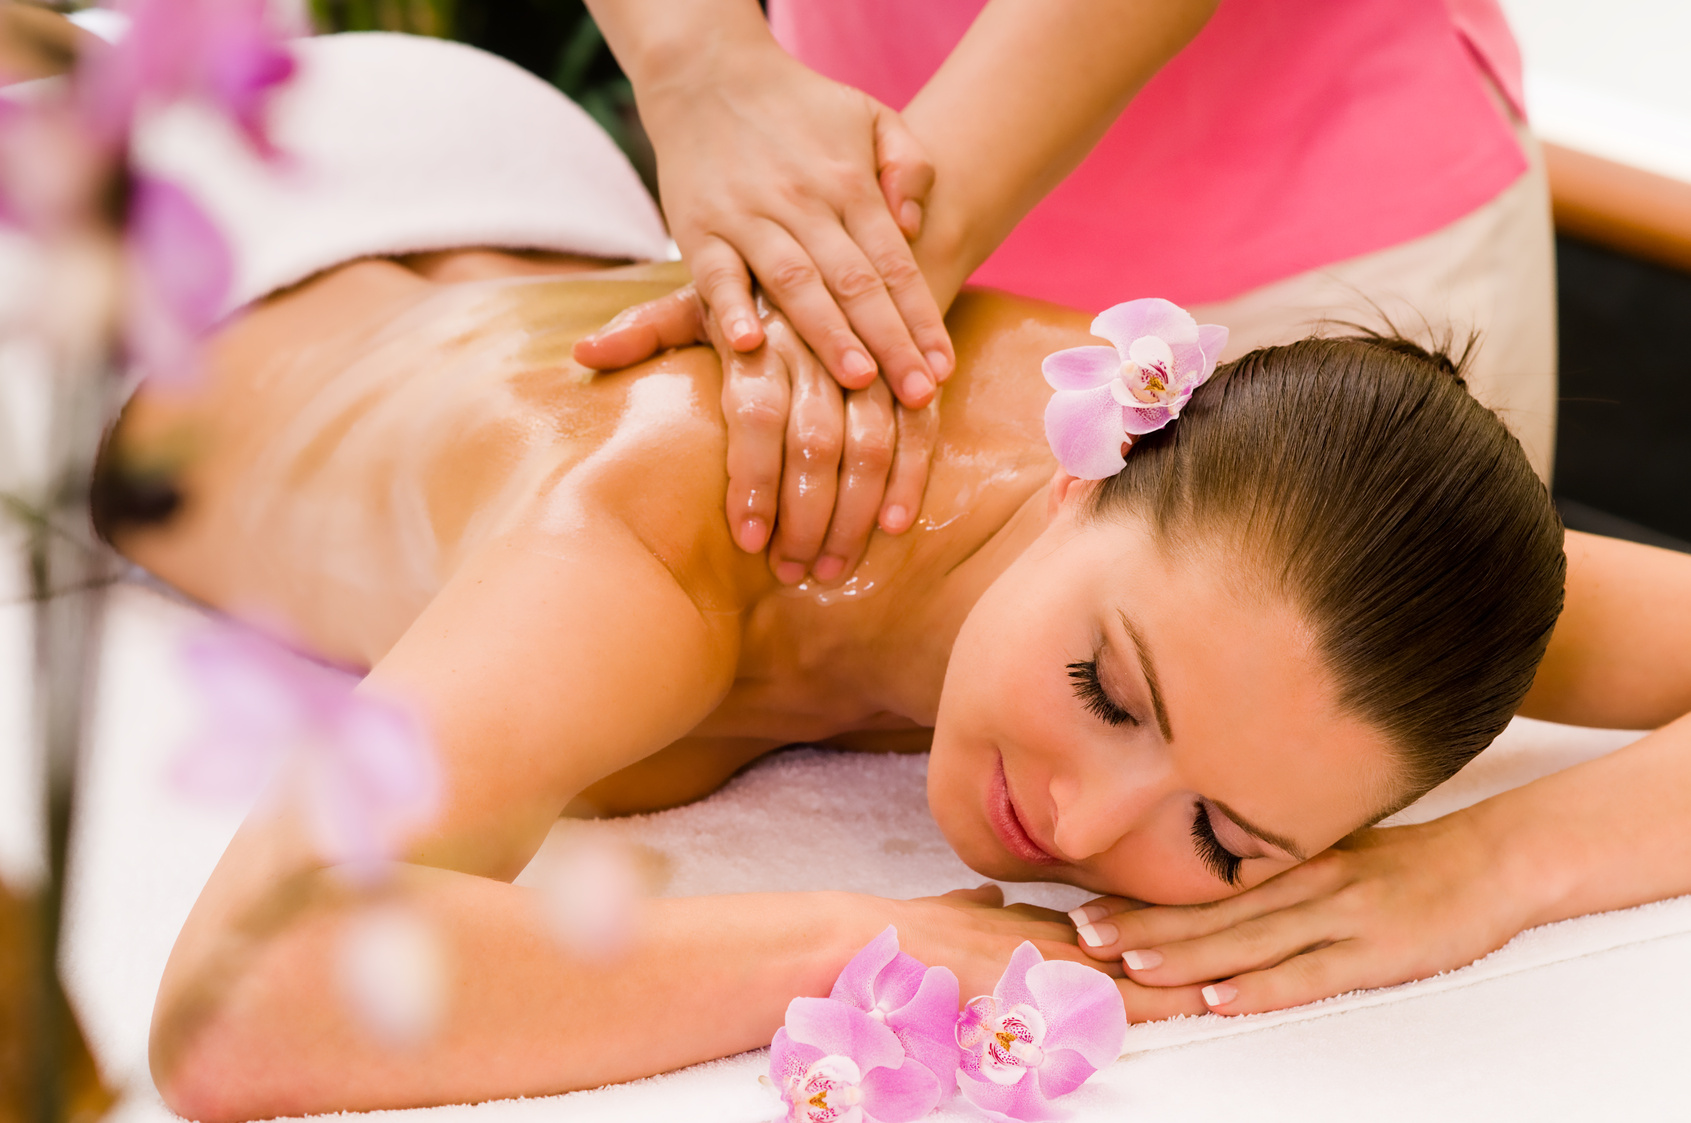 see-x-massage